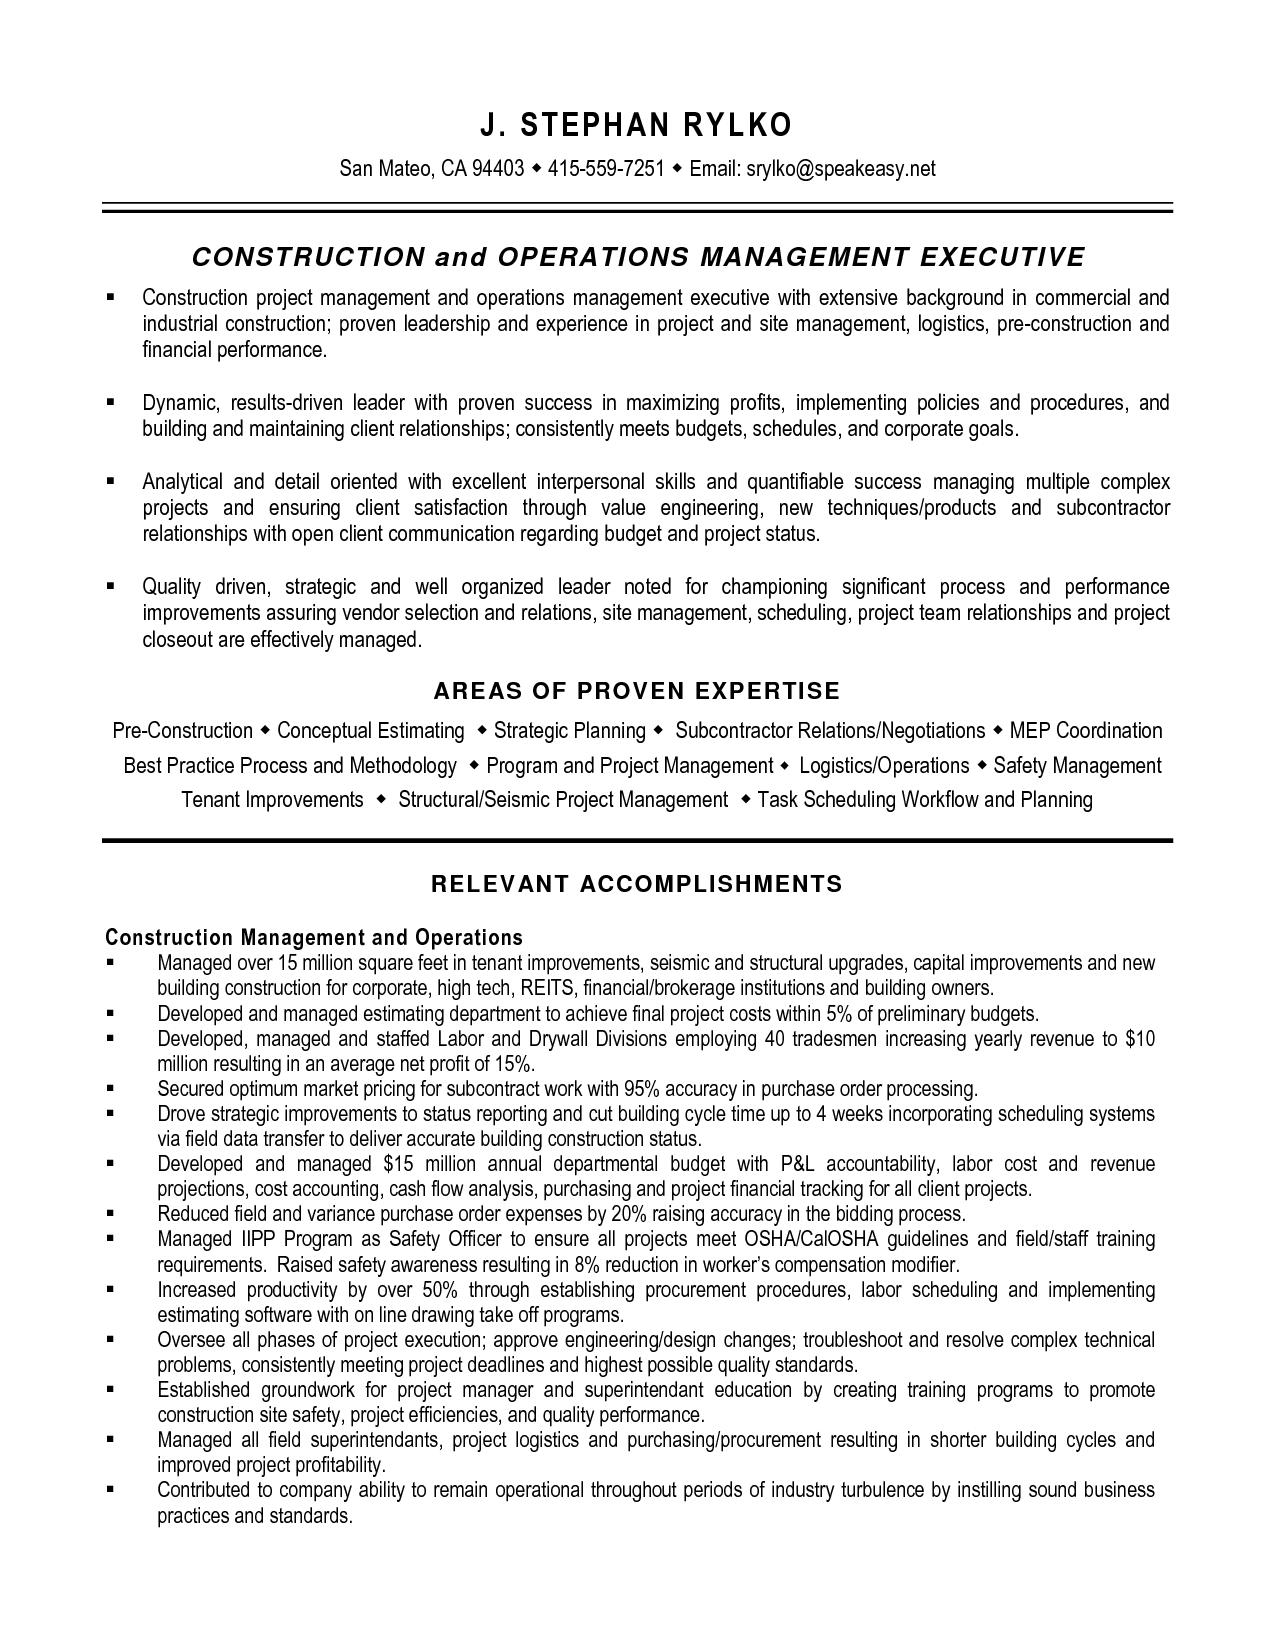 28 qa qc inspector resume sle www collegesinpa org | News to Go 2 ...